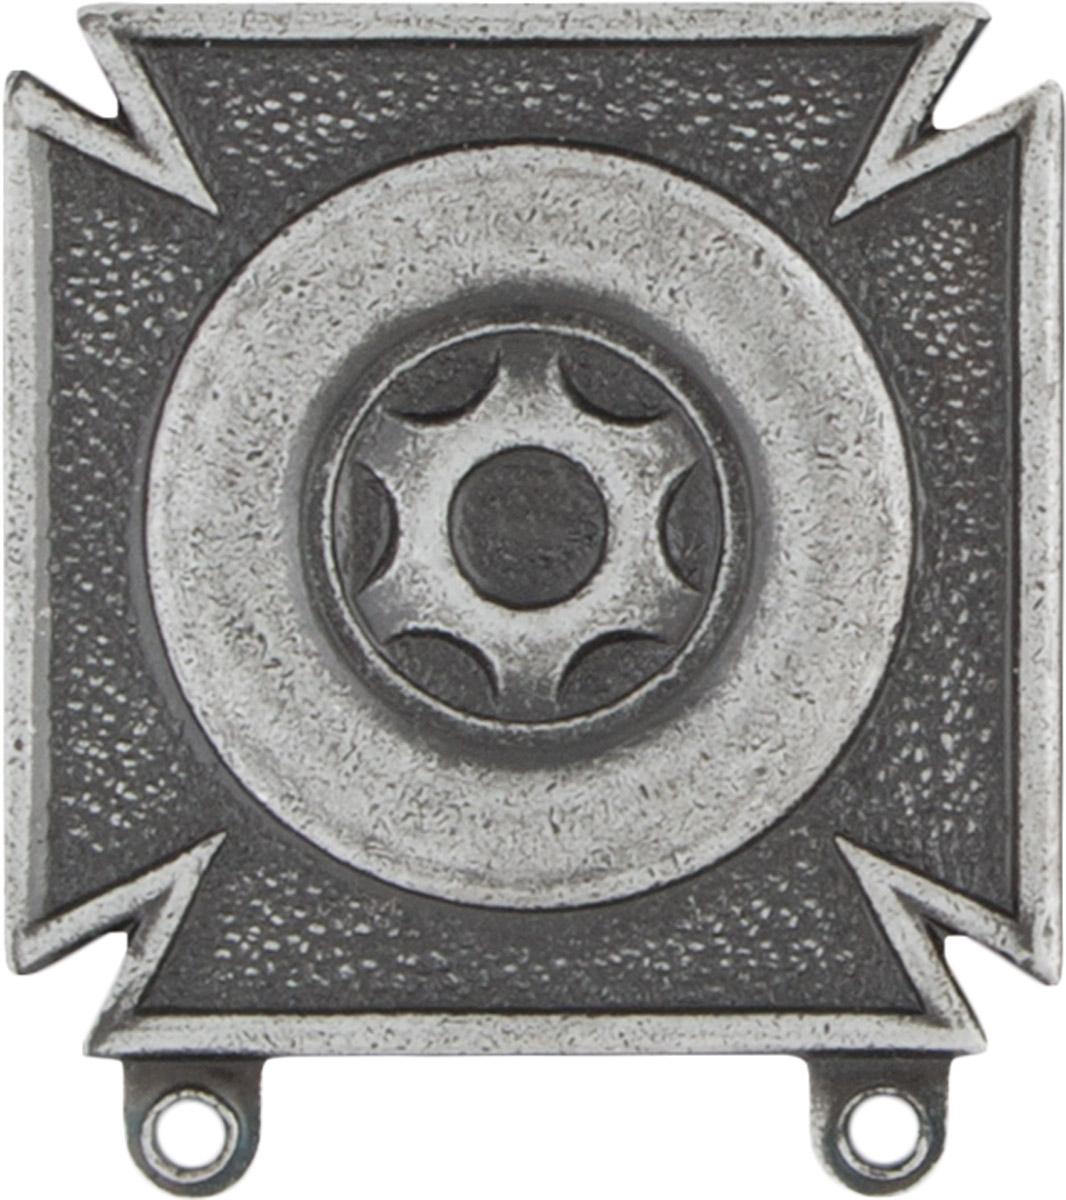 Driver Badge